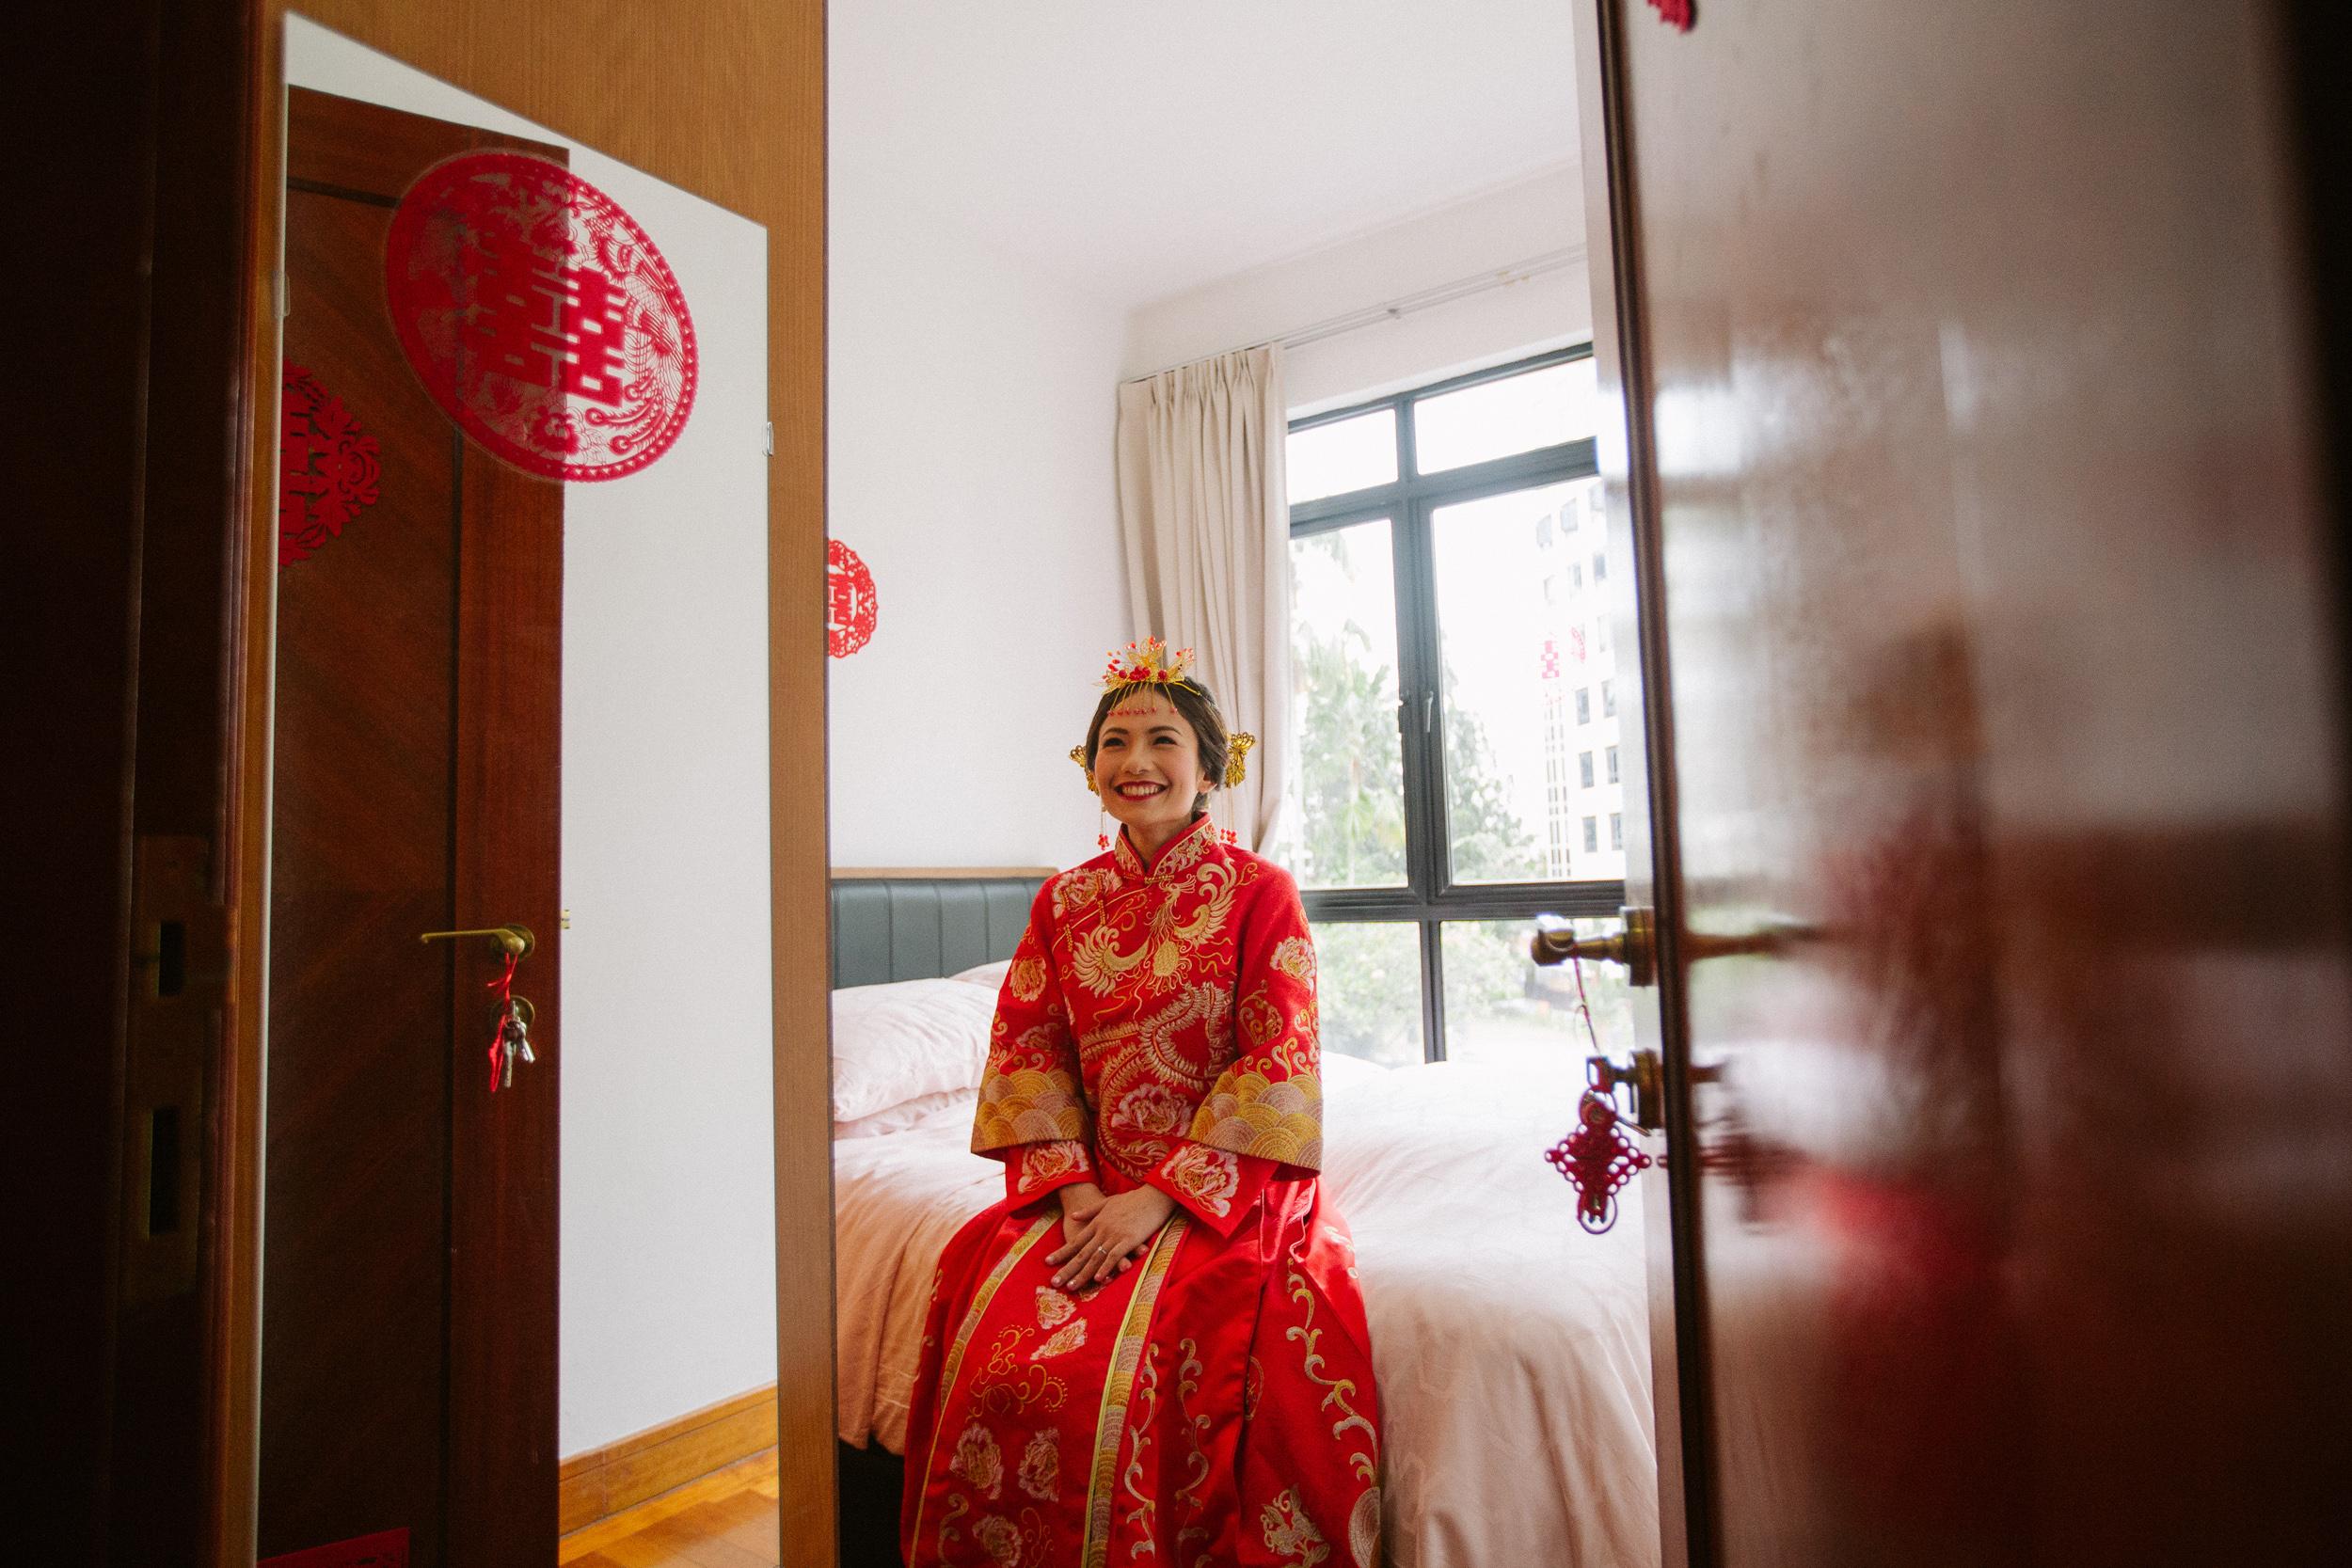 singapore-wedding-photographer-cheryl-matthew-fullerton-hotel-wedding-23.jpg